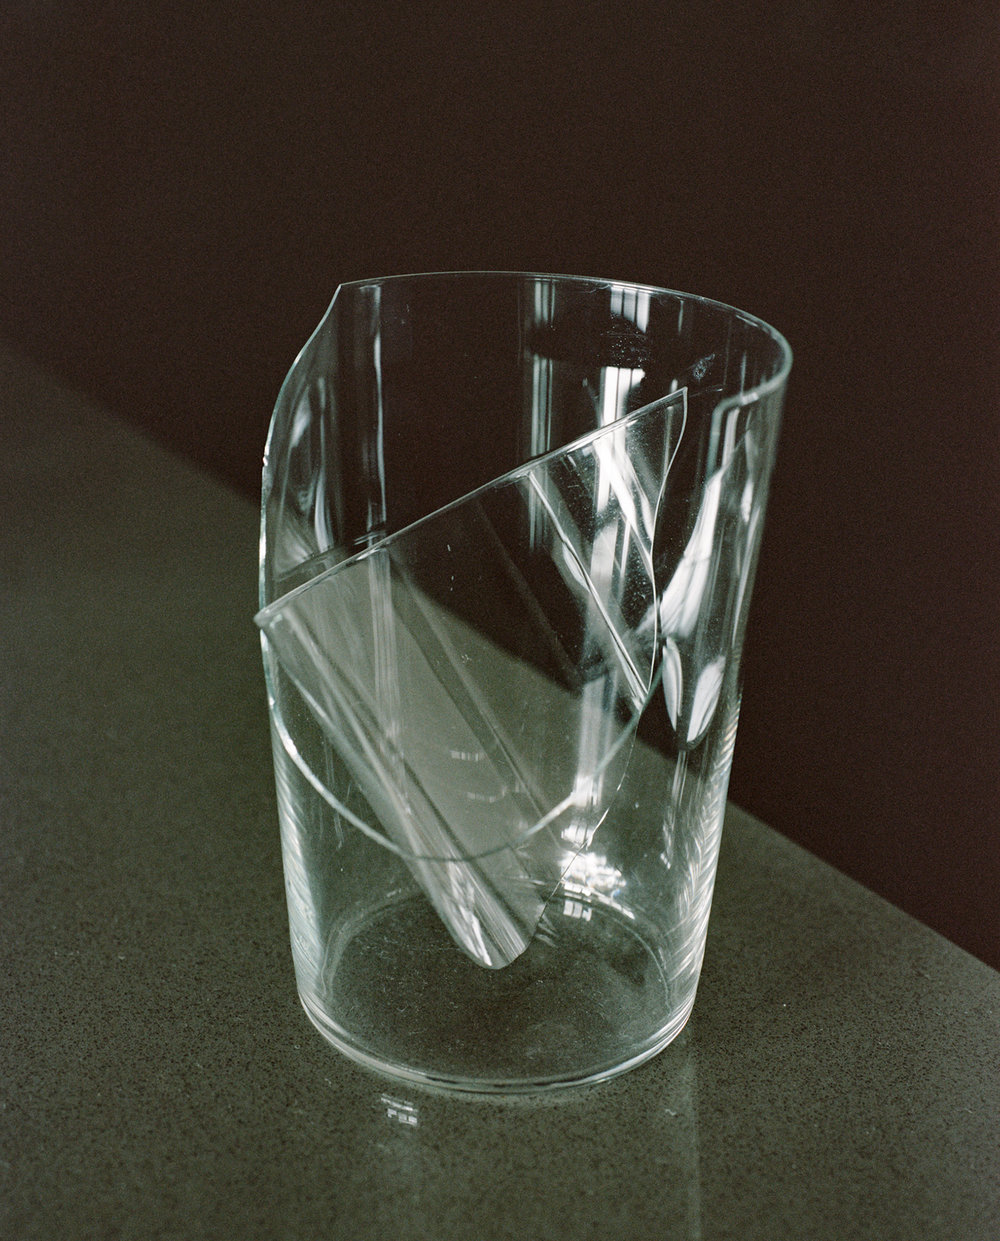 Broken Glass #7